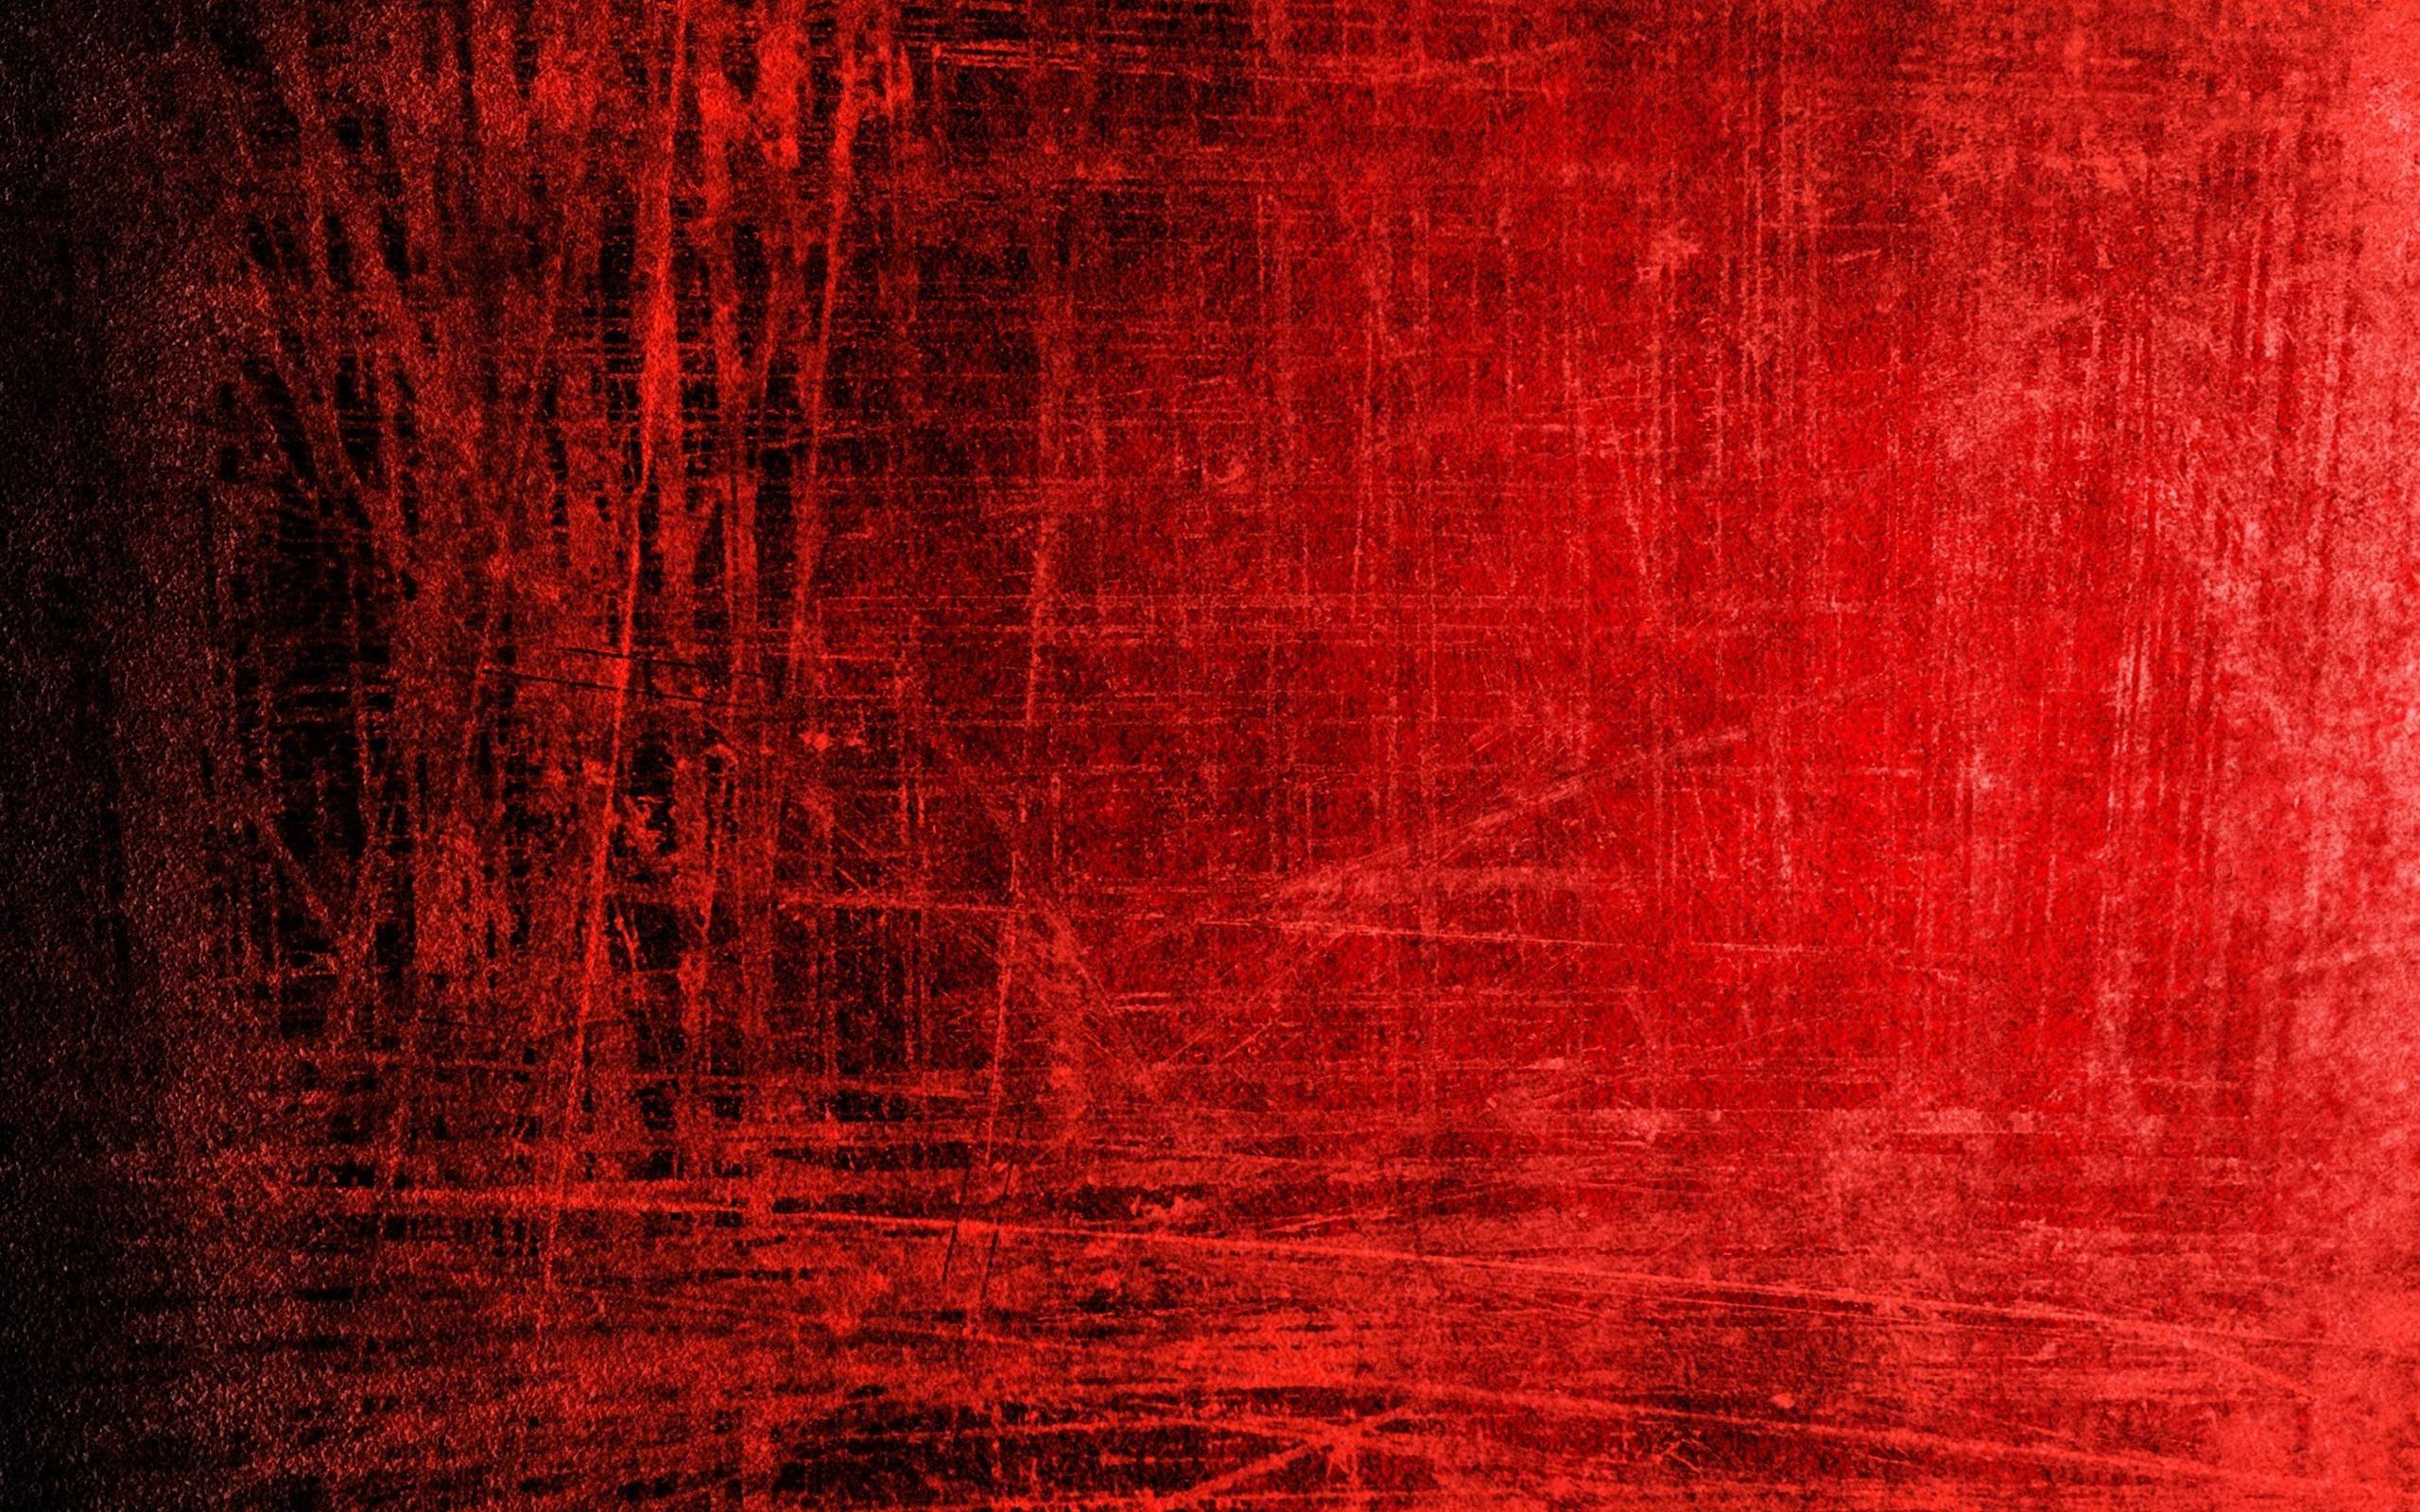 Red Background Fullscreen HD #6416 Wallpaper   Cool Walldiskpaper.com